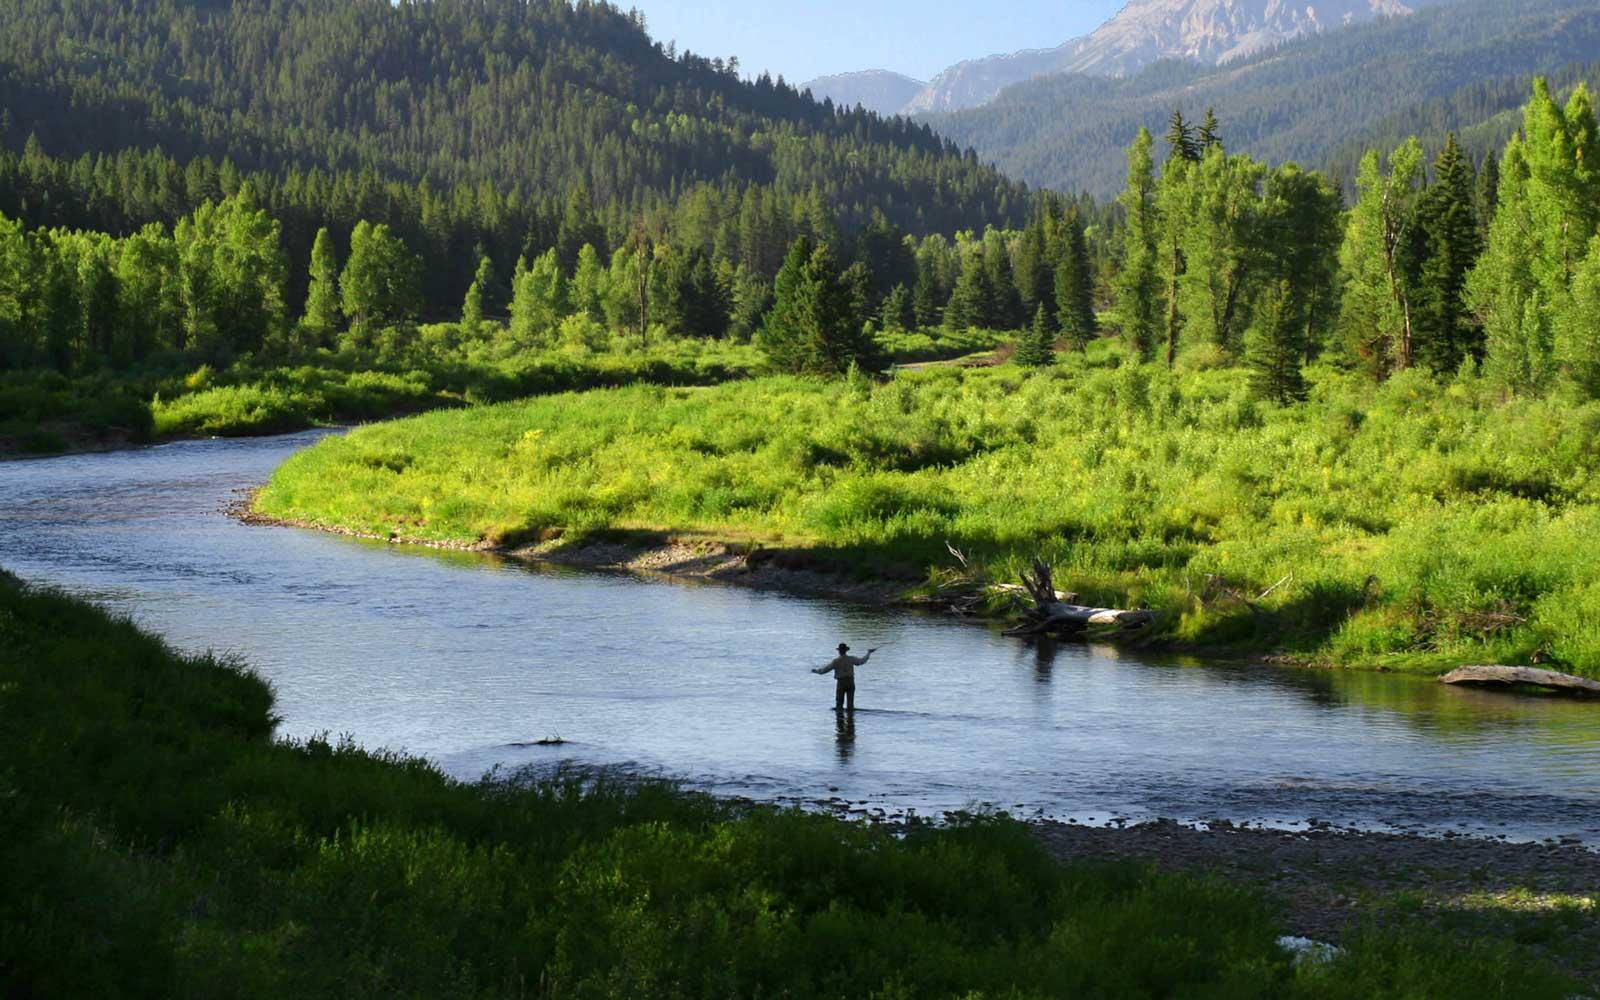 Spring Creek & Stream Fishing